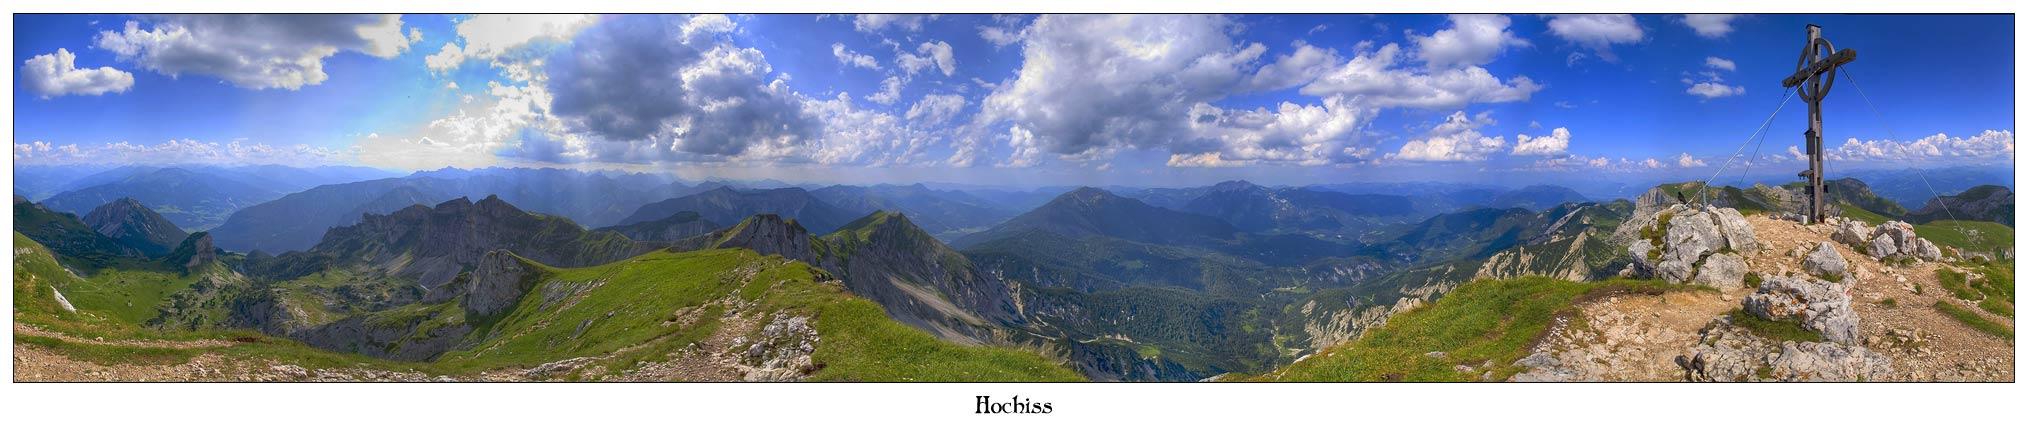 Hochiss